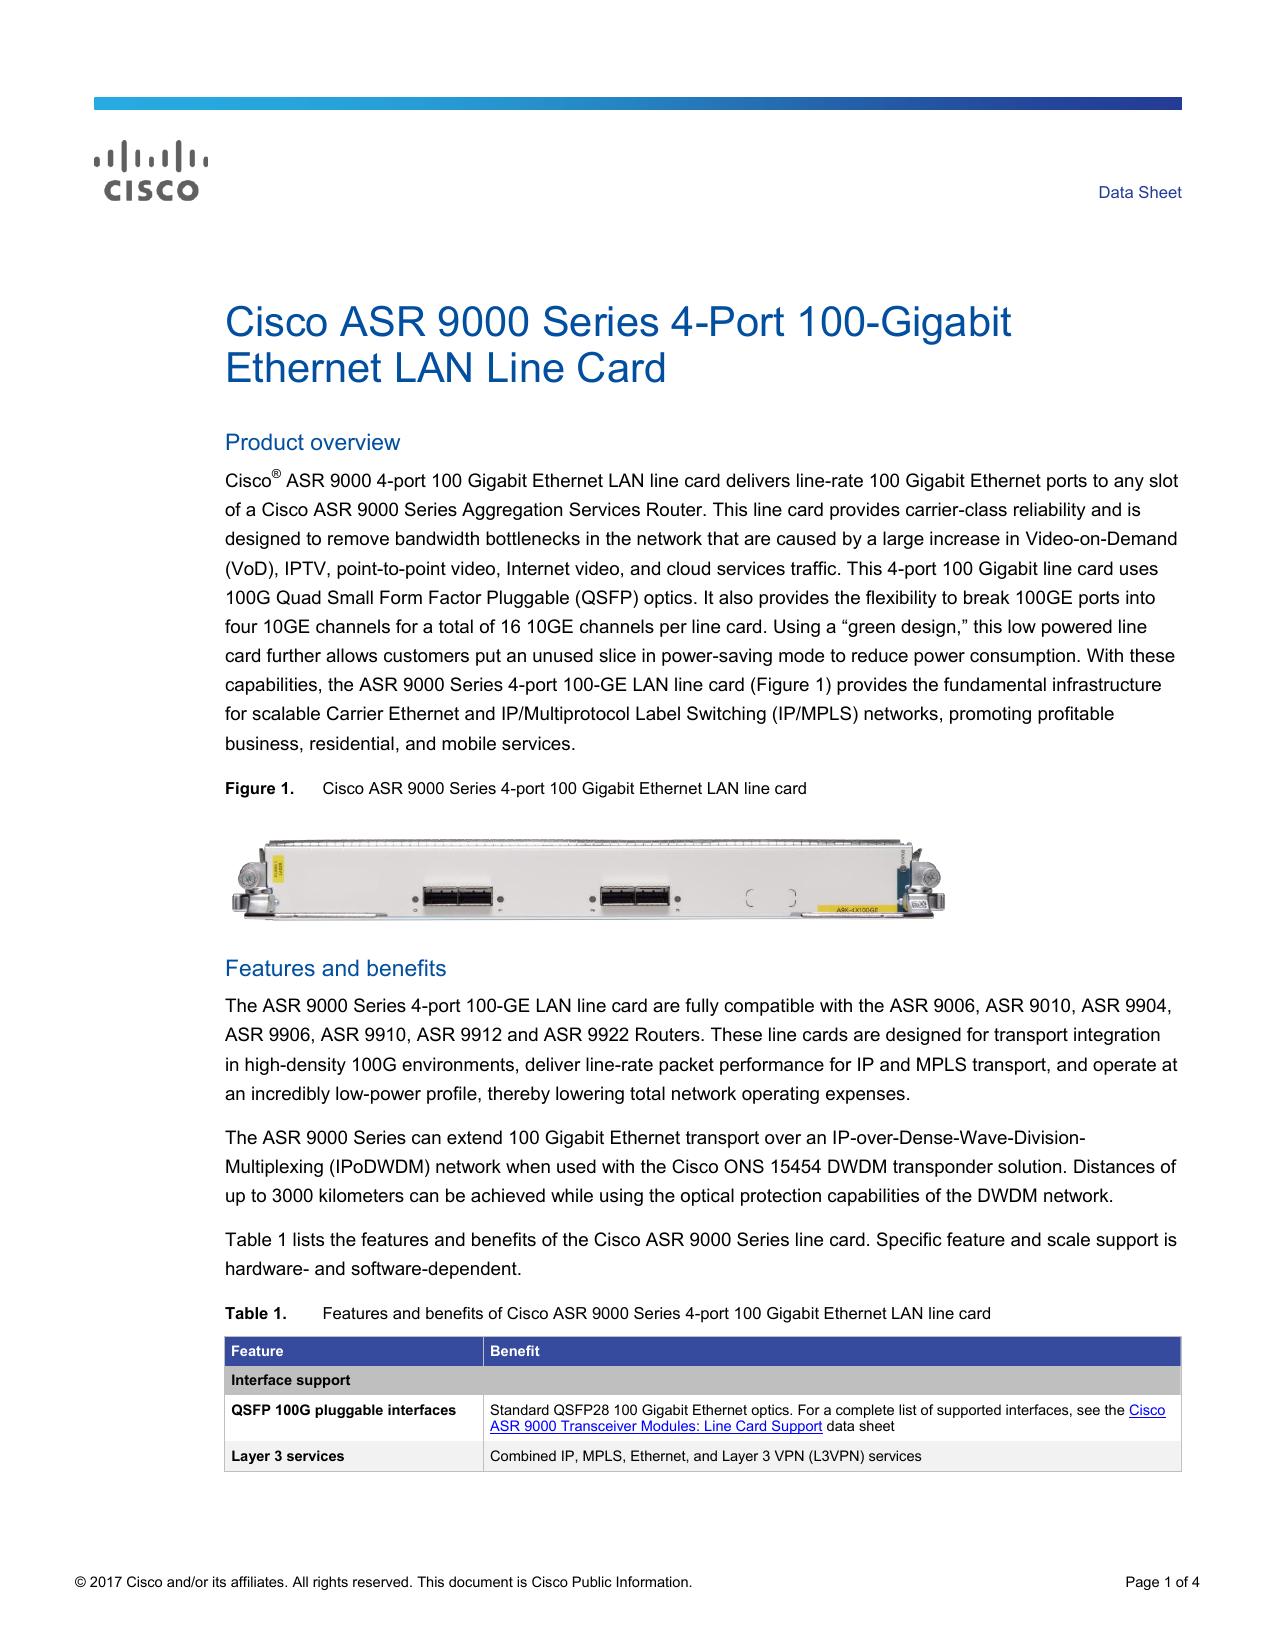 Cisco ASR 9000 Series 4-Port 100-Gigabit Ethernet LAN Line